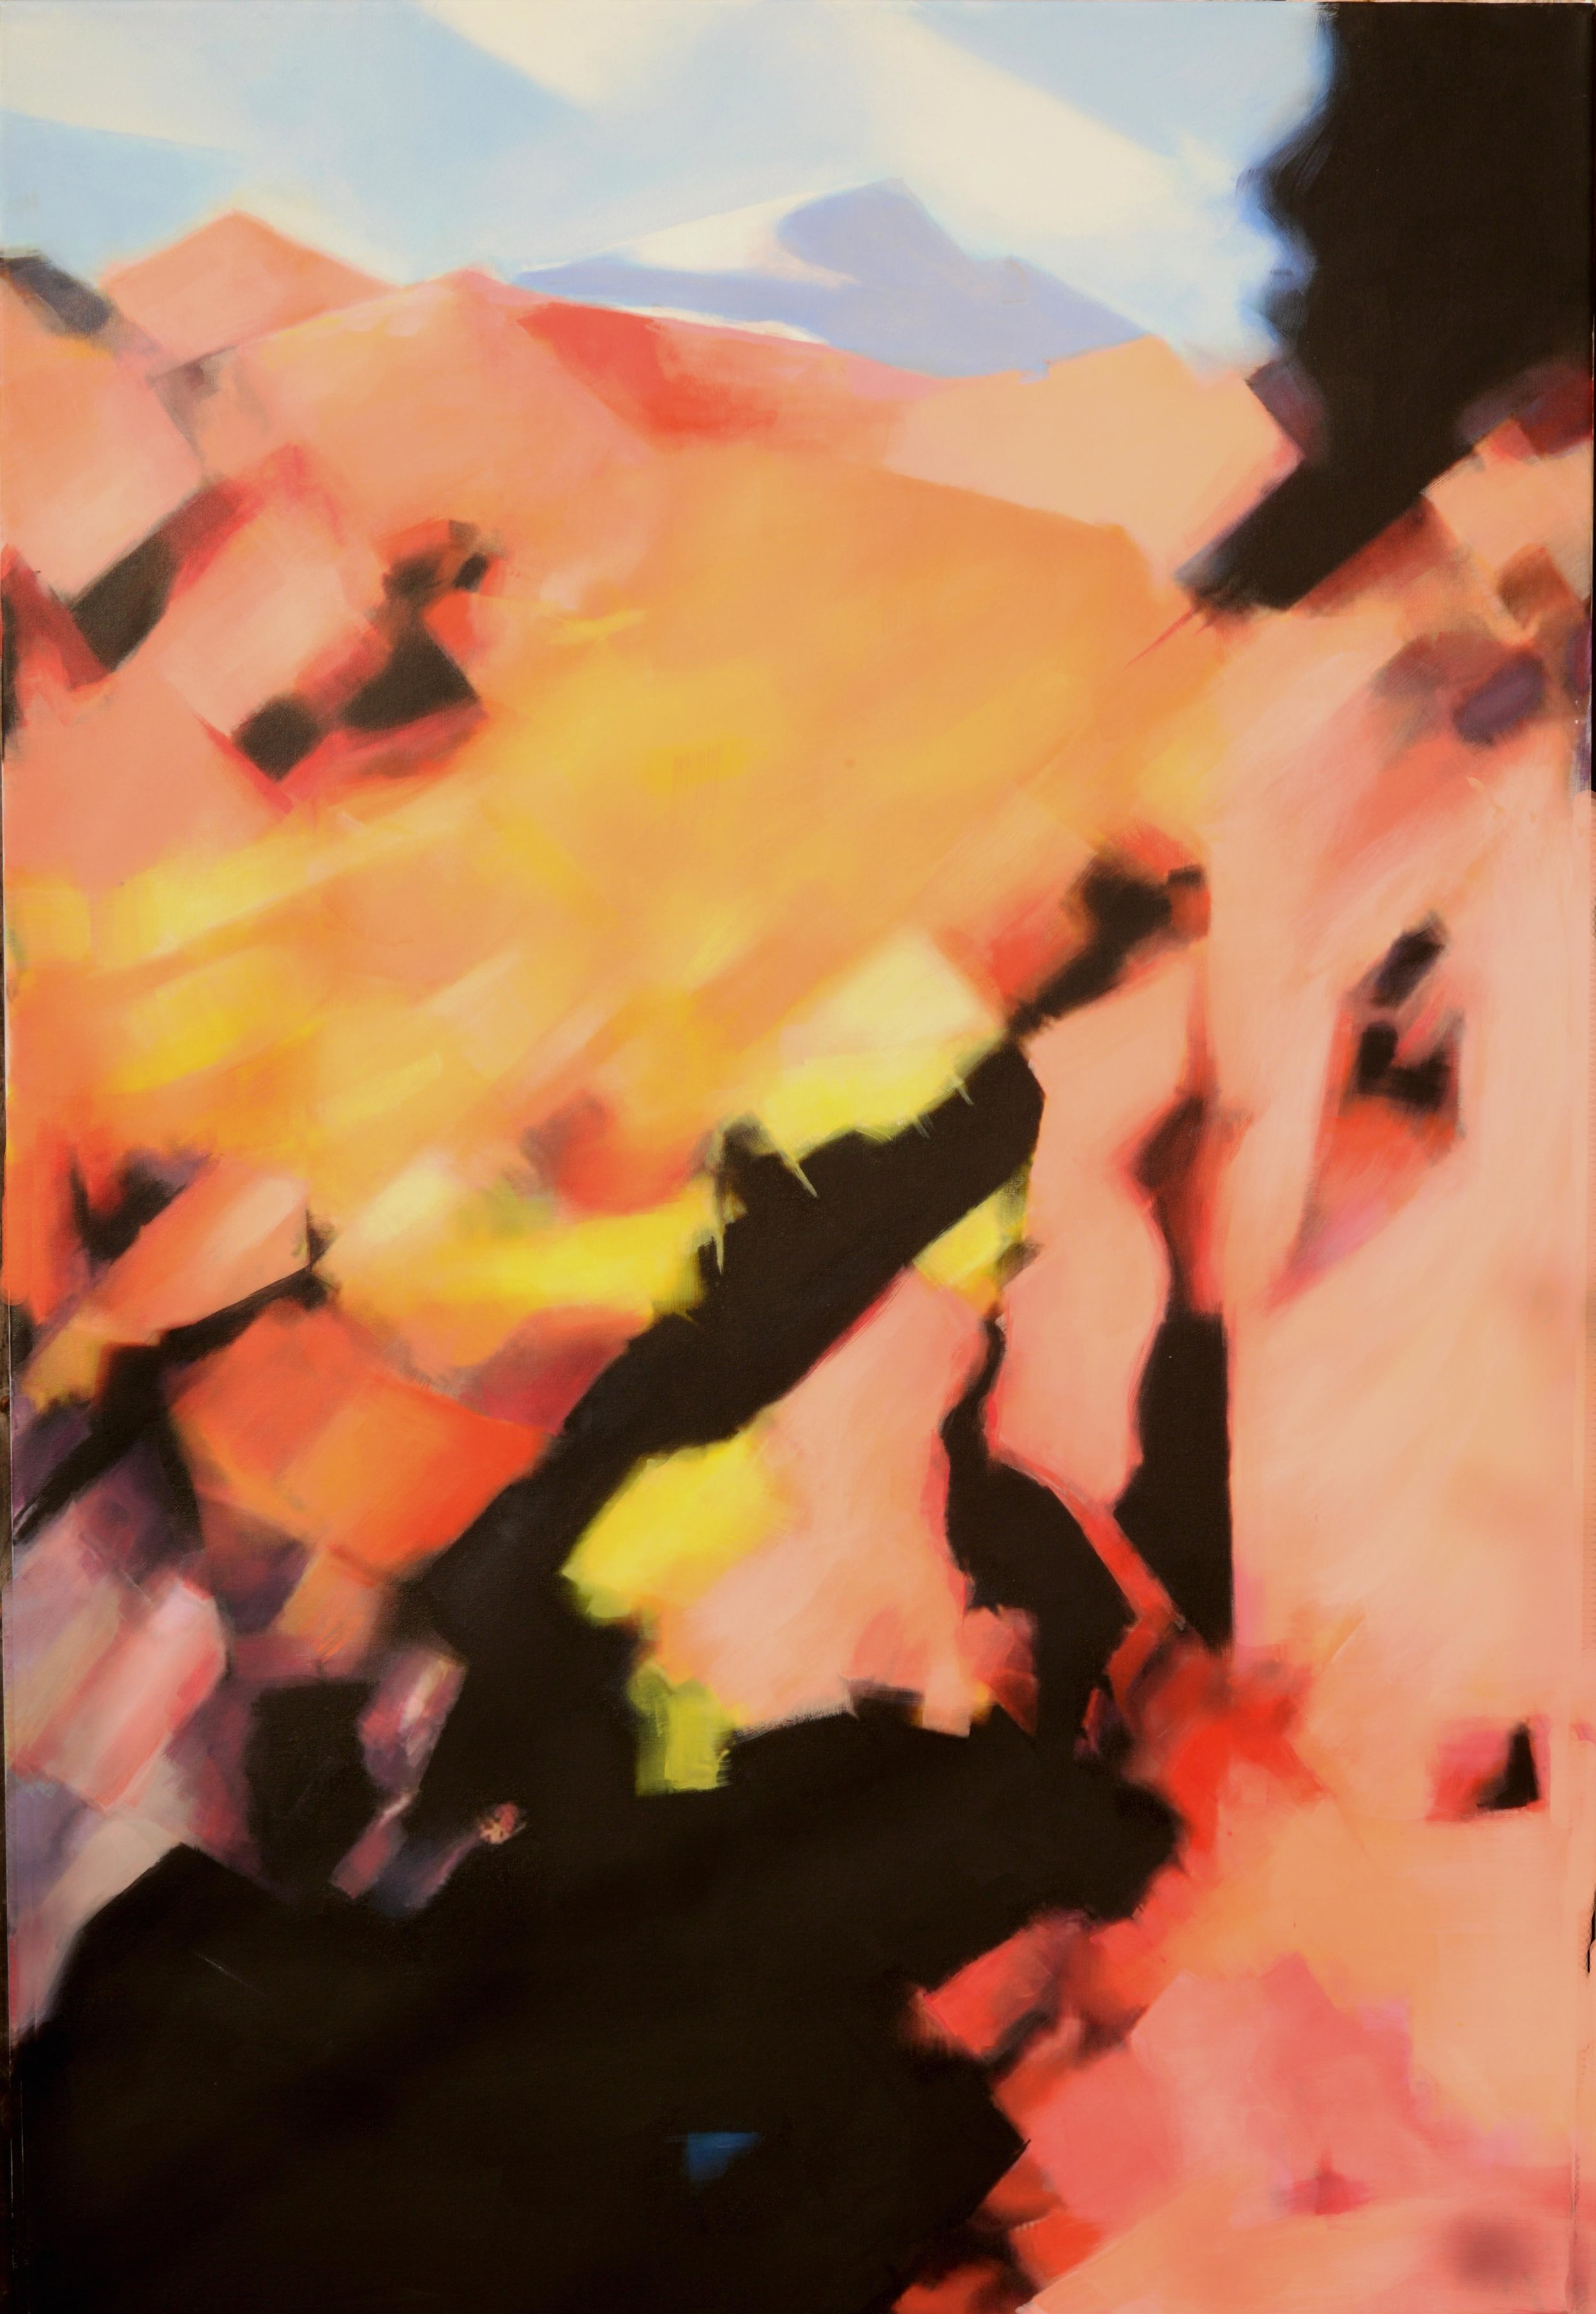 pink rock   95 x 140 cm  Acryl auf Leinwand  2017